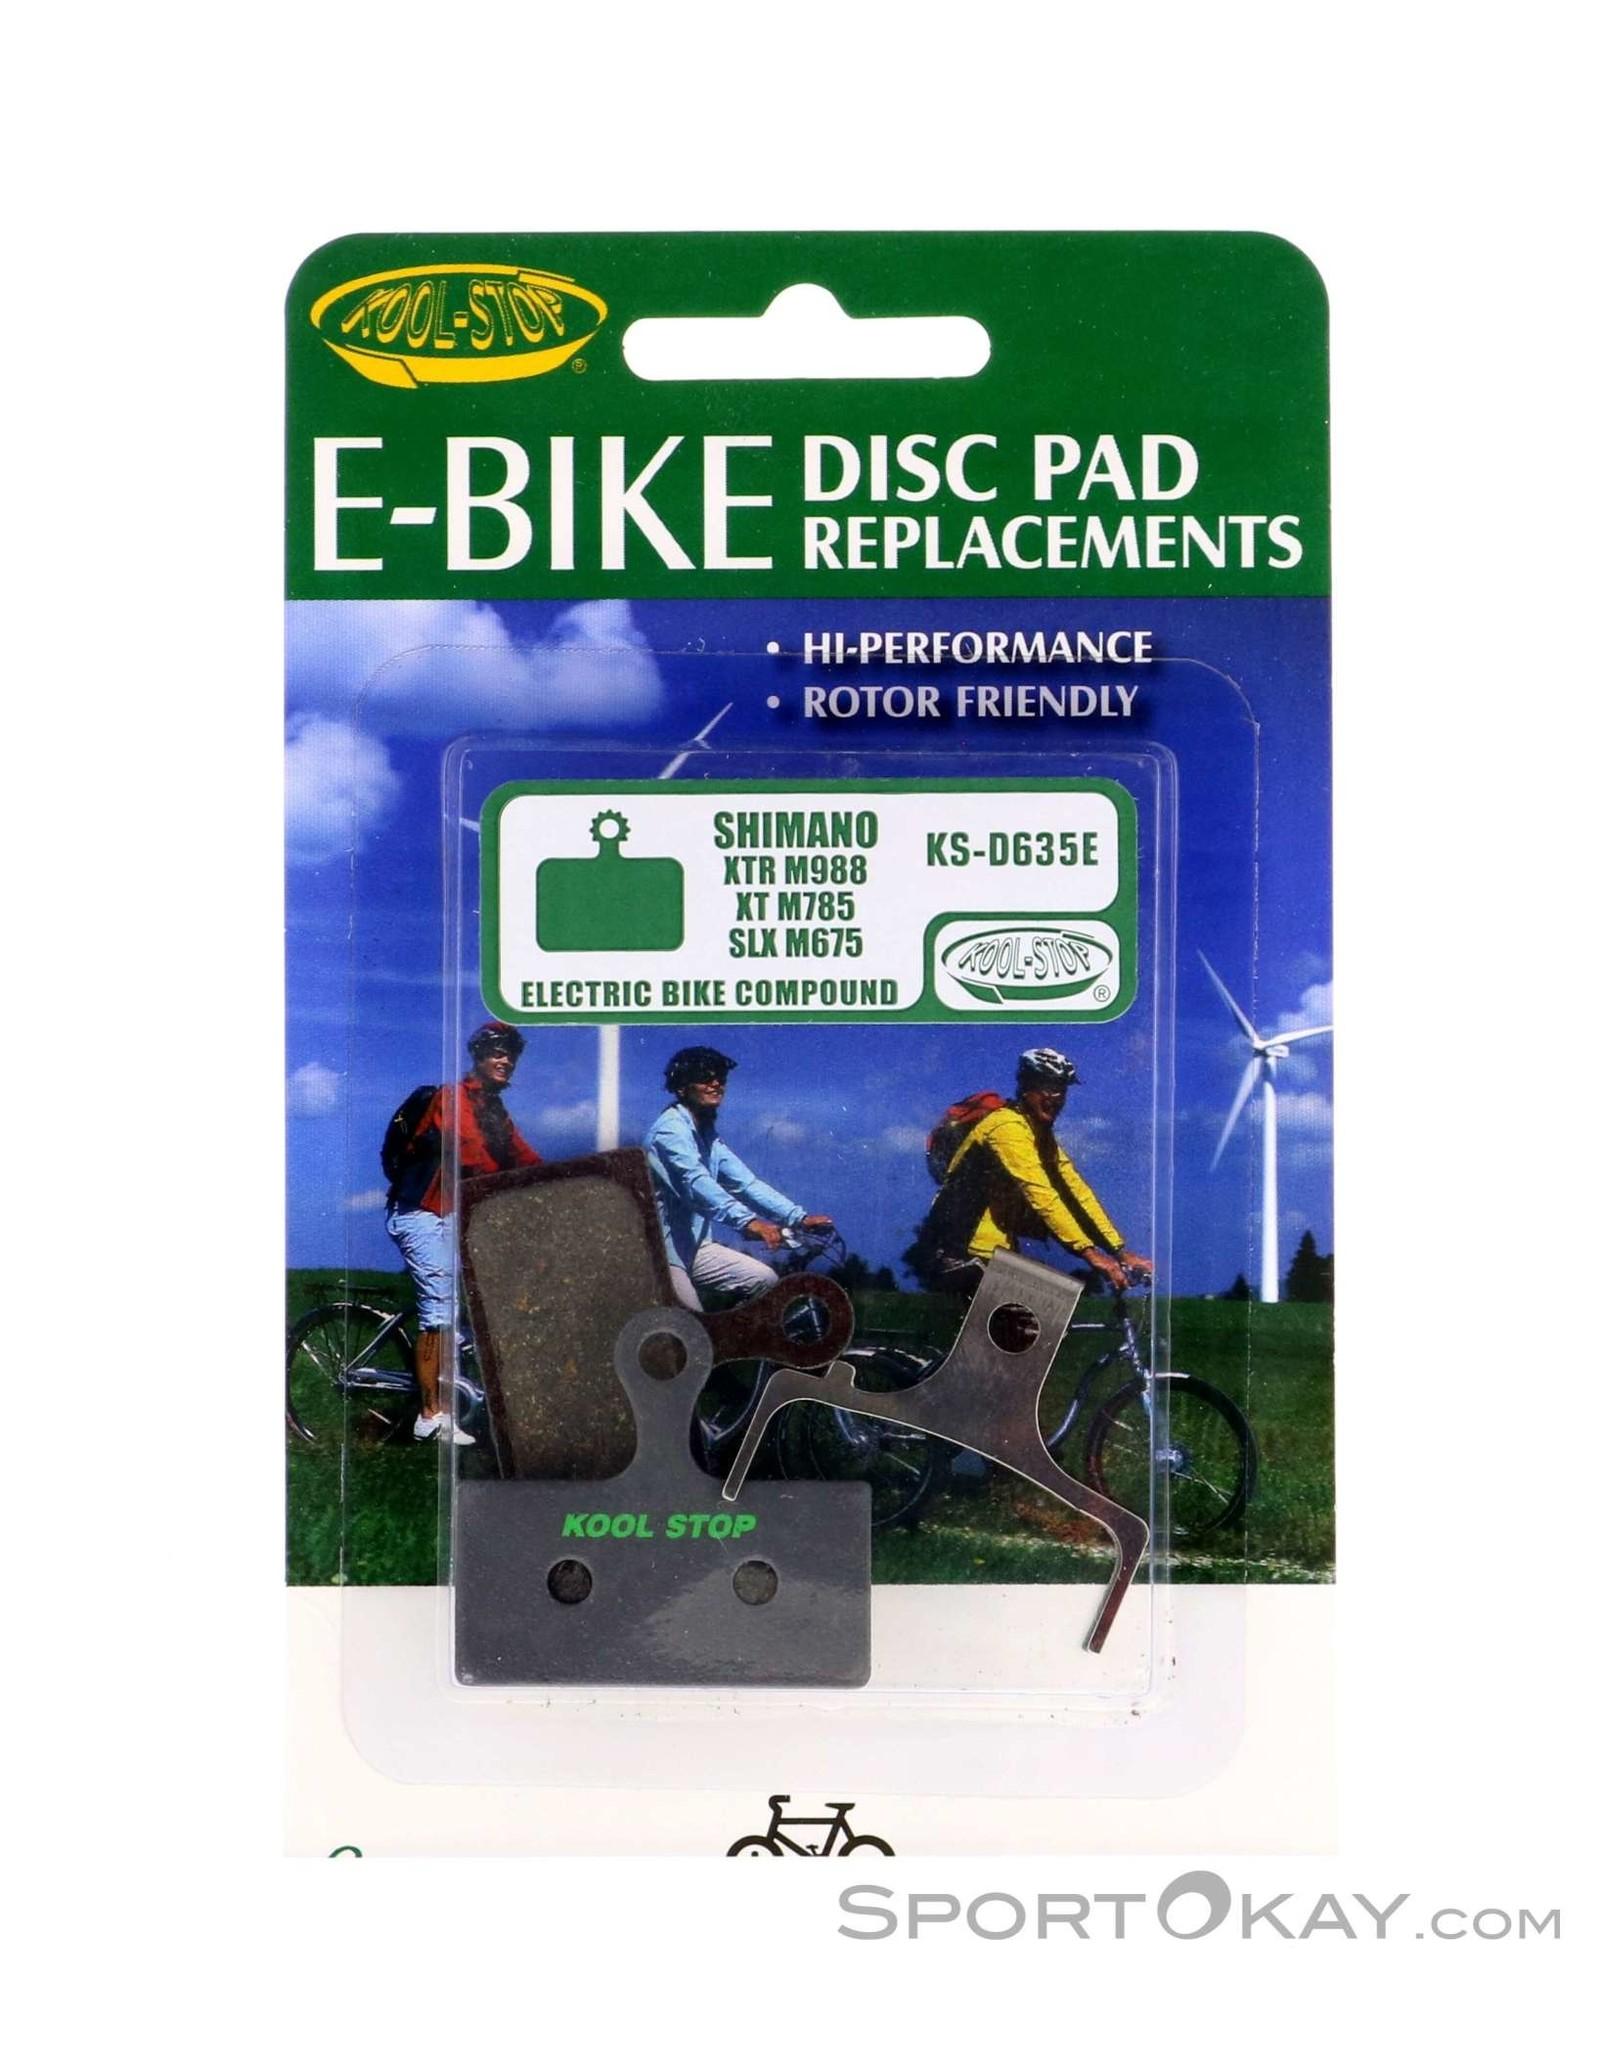 KOOLSTOP DISC PAD REPLACEMENT KOOLSTP DB-PD XTR 2011 ELEC